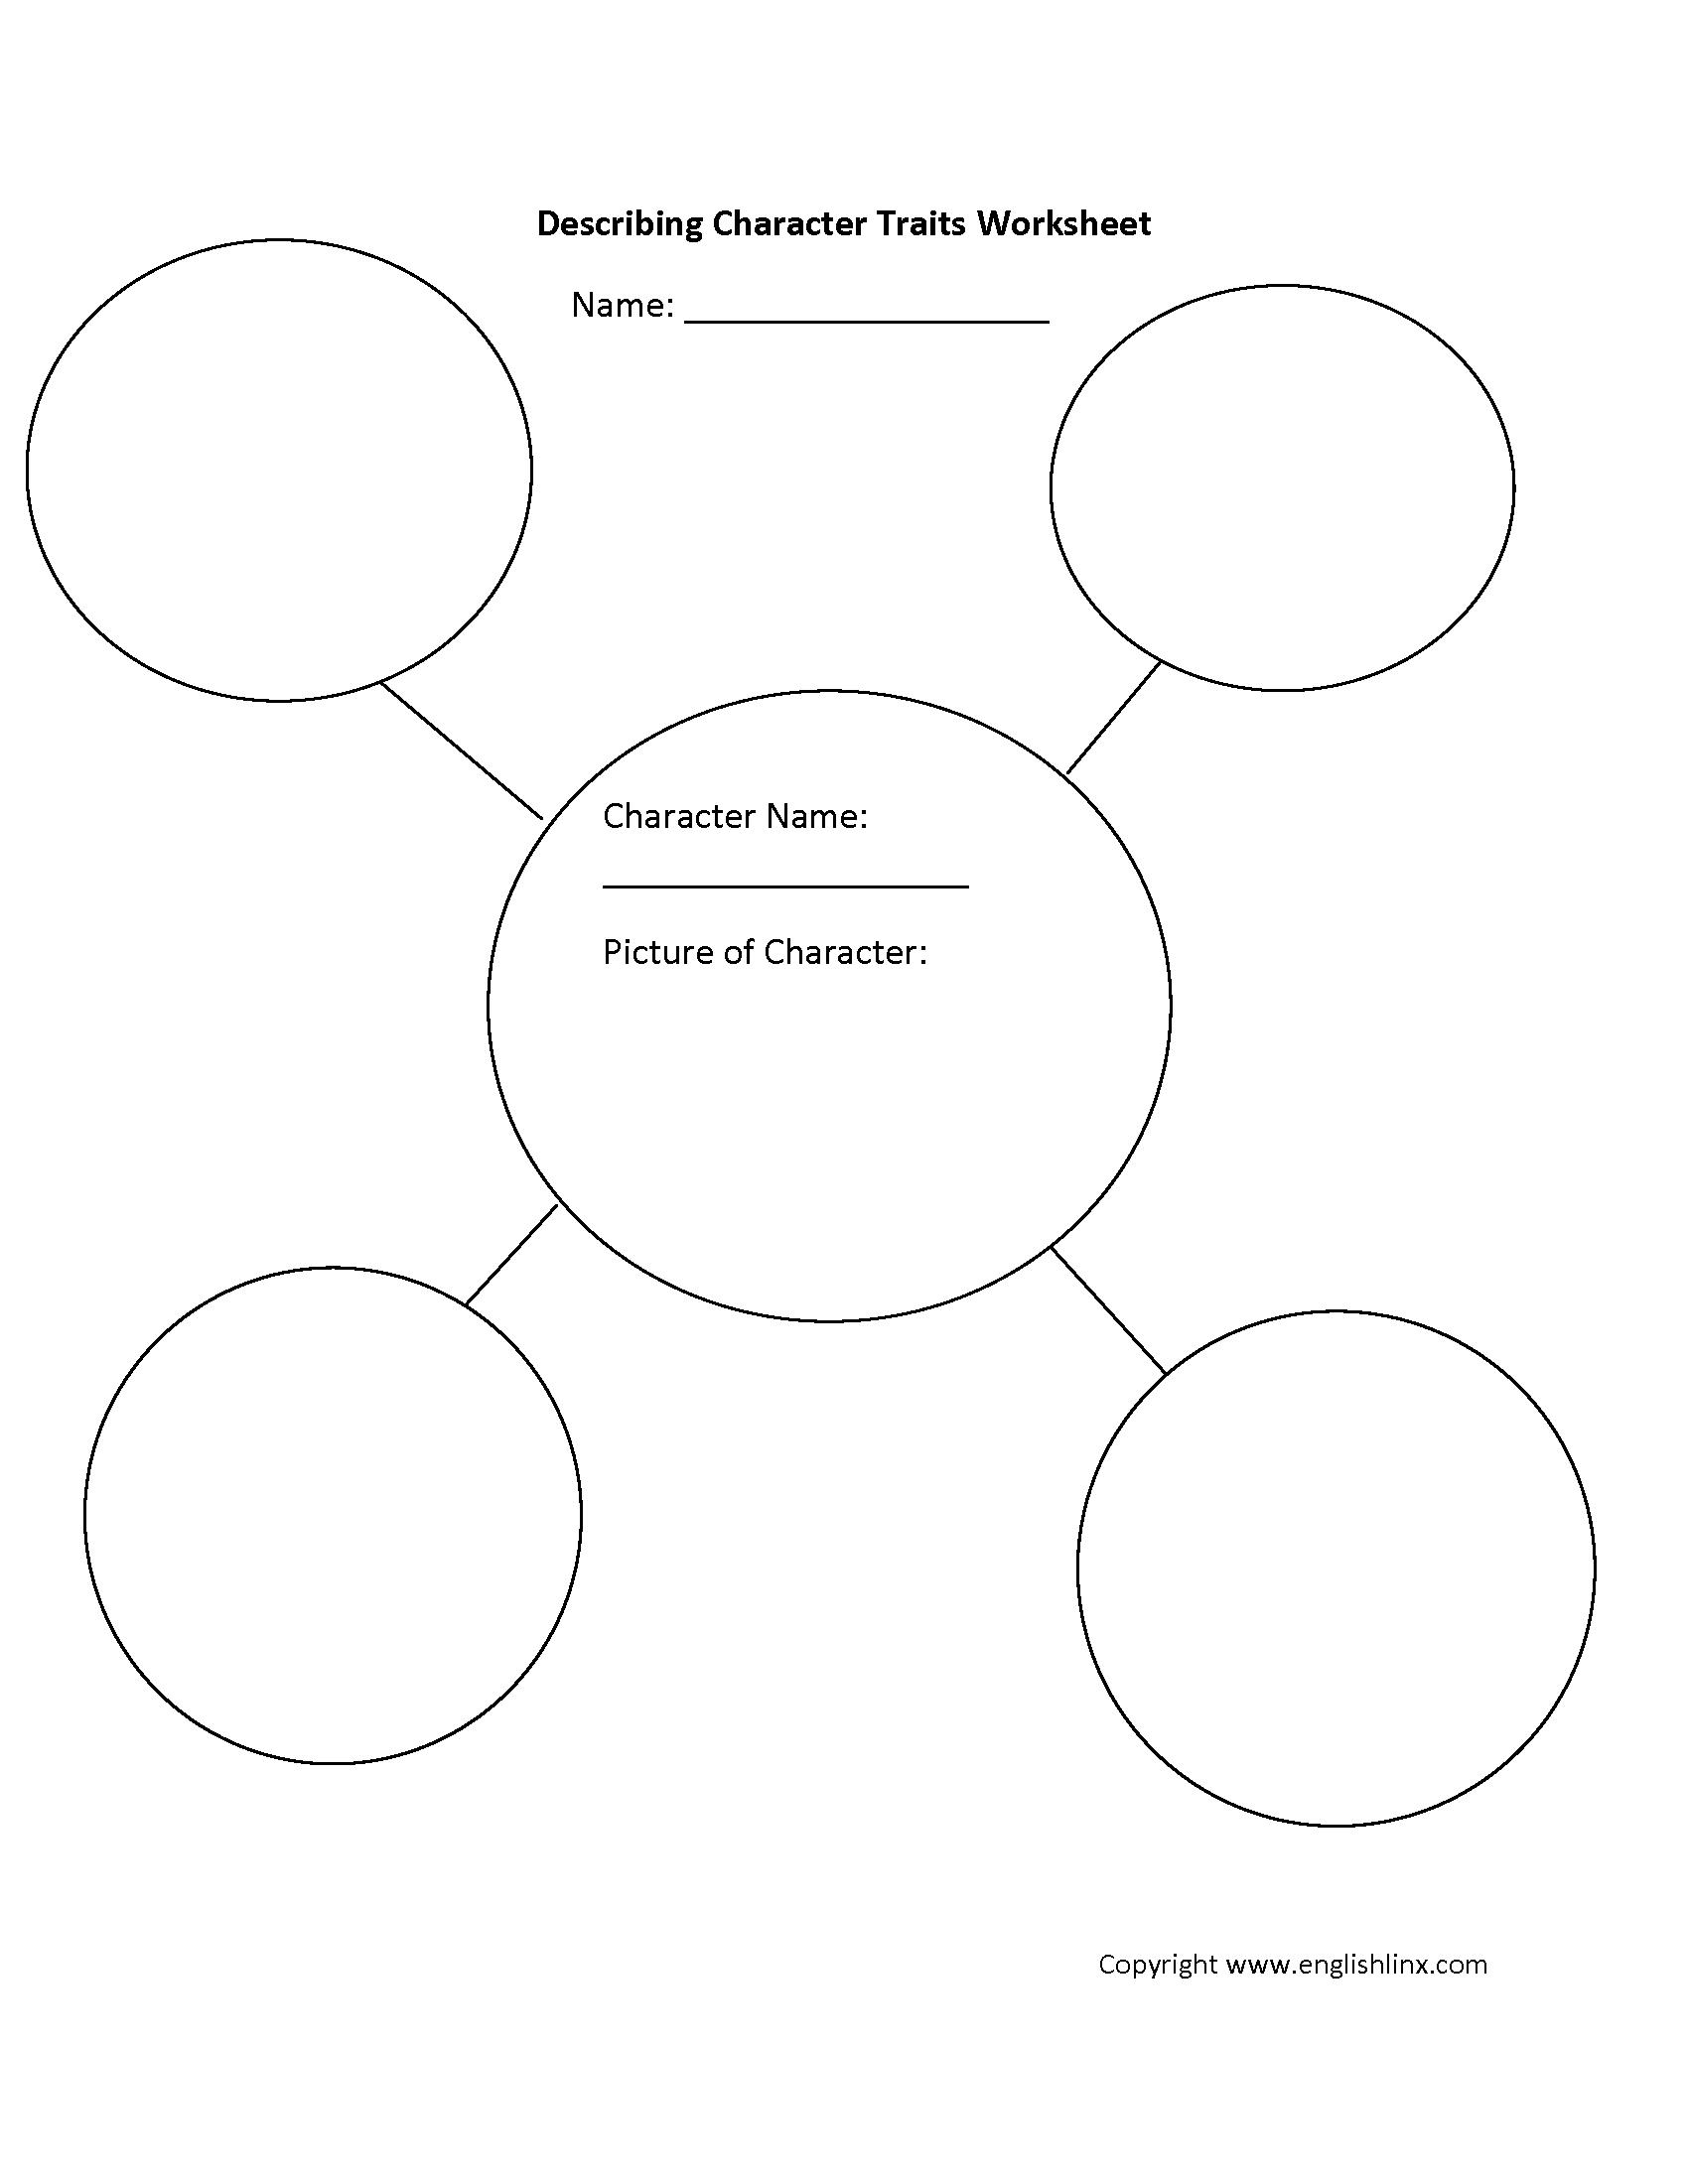 Describing Character Traits Worksheet